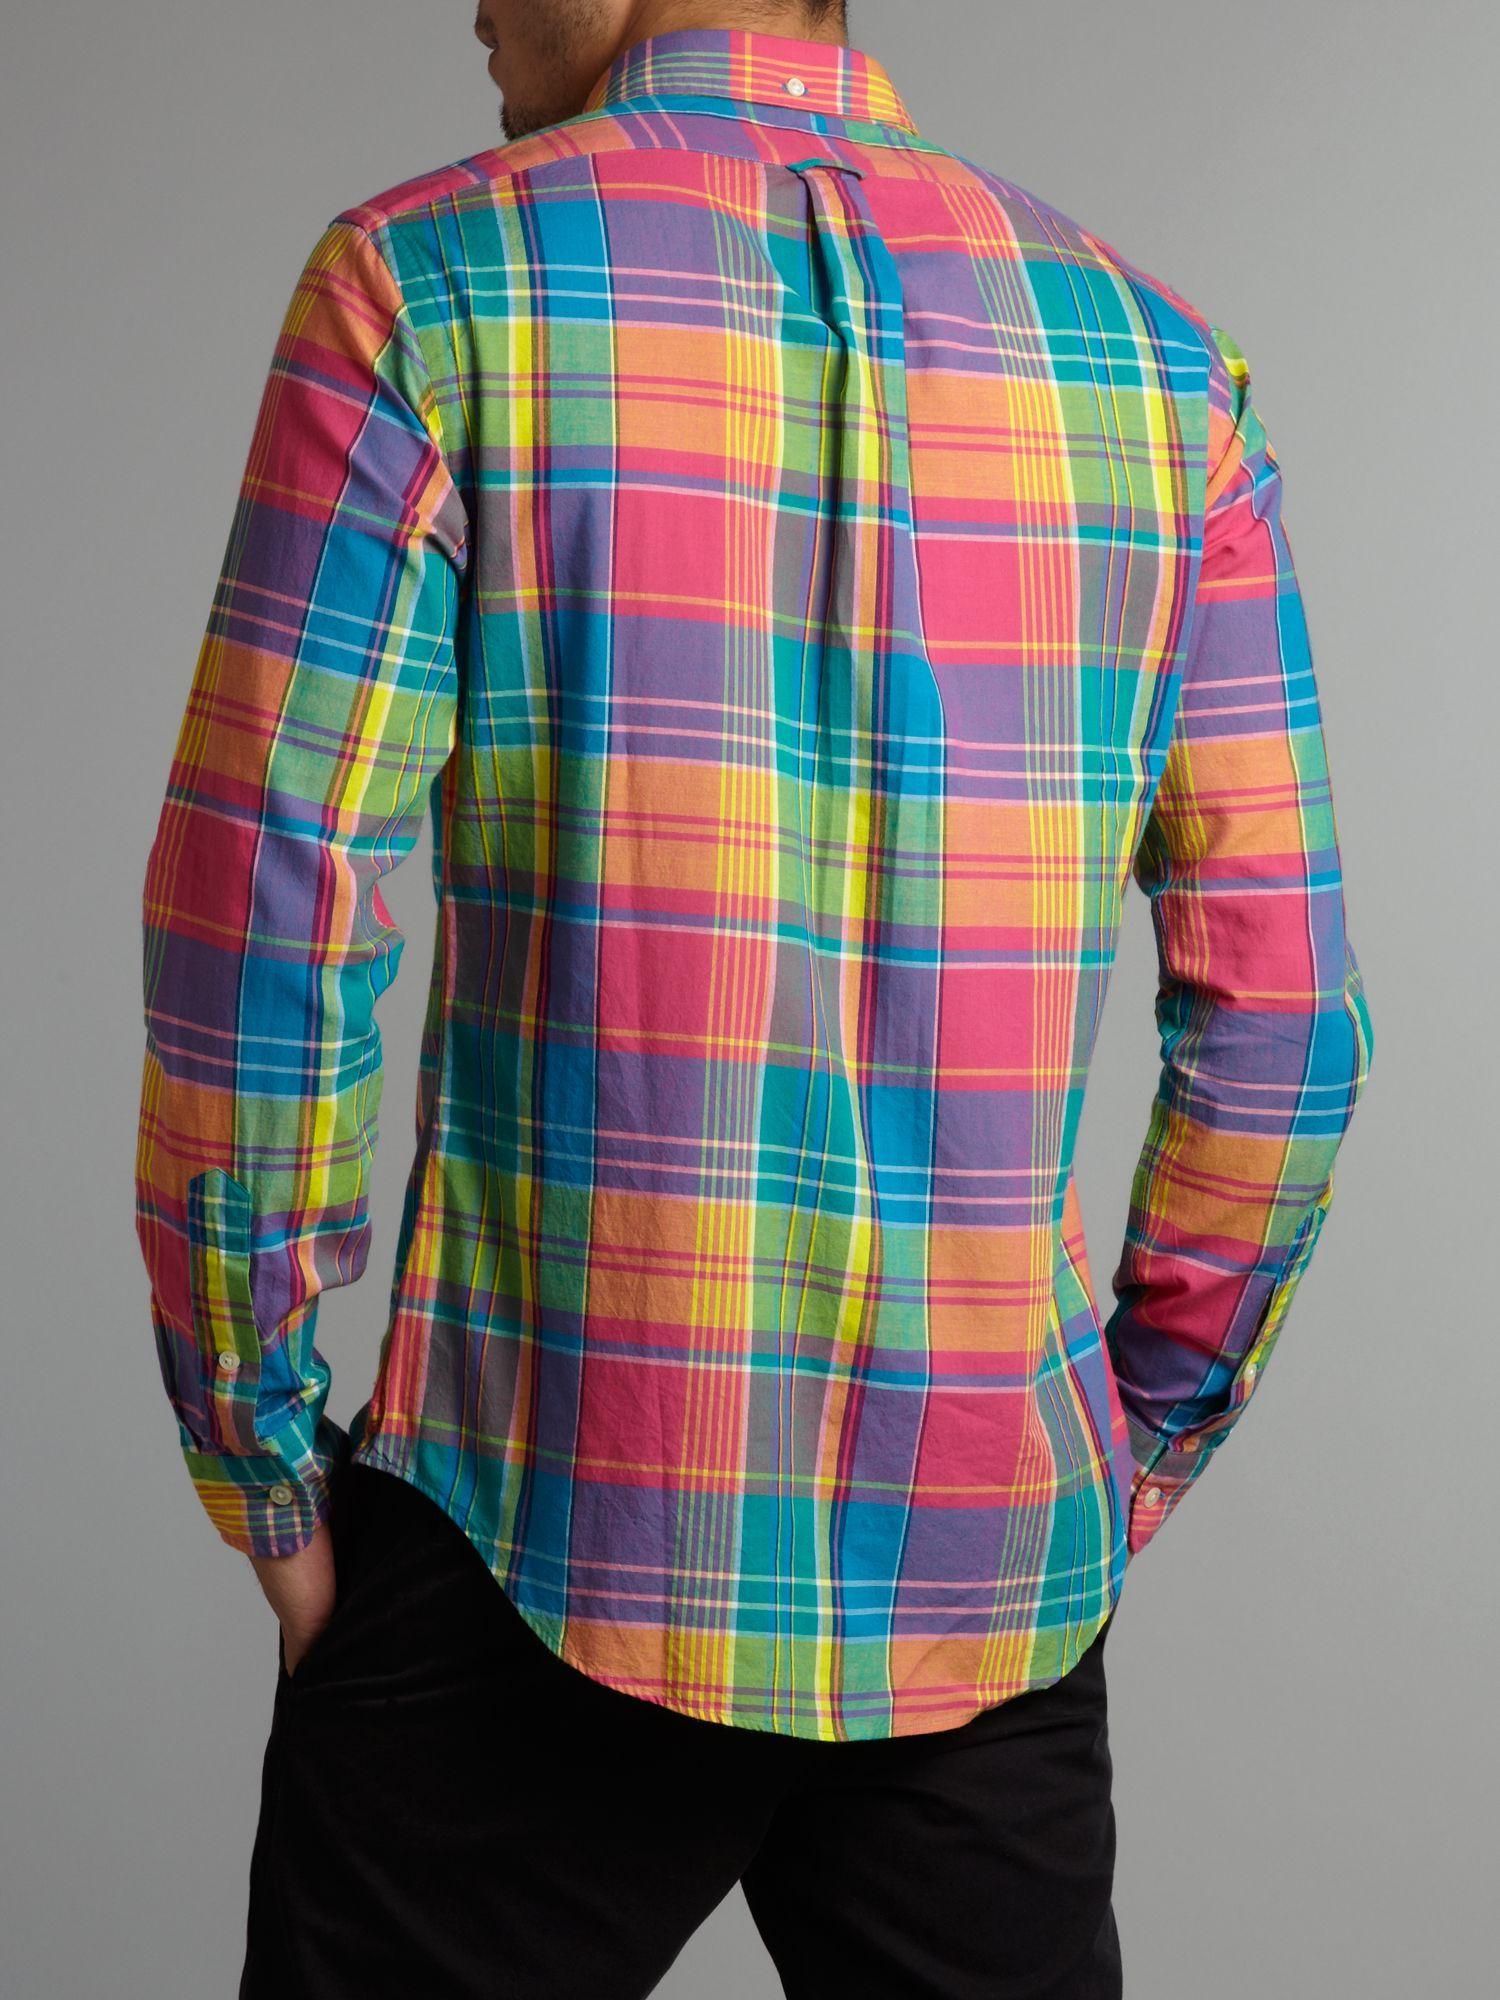 Polo ralph lauren Slim Fit Bright Plaid Shirt in Multicolor for ... 45cfa5538fd